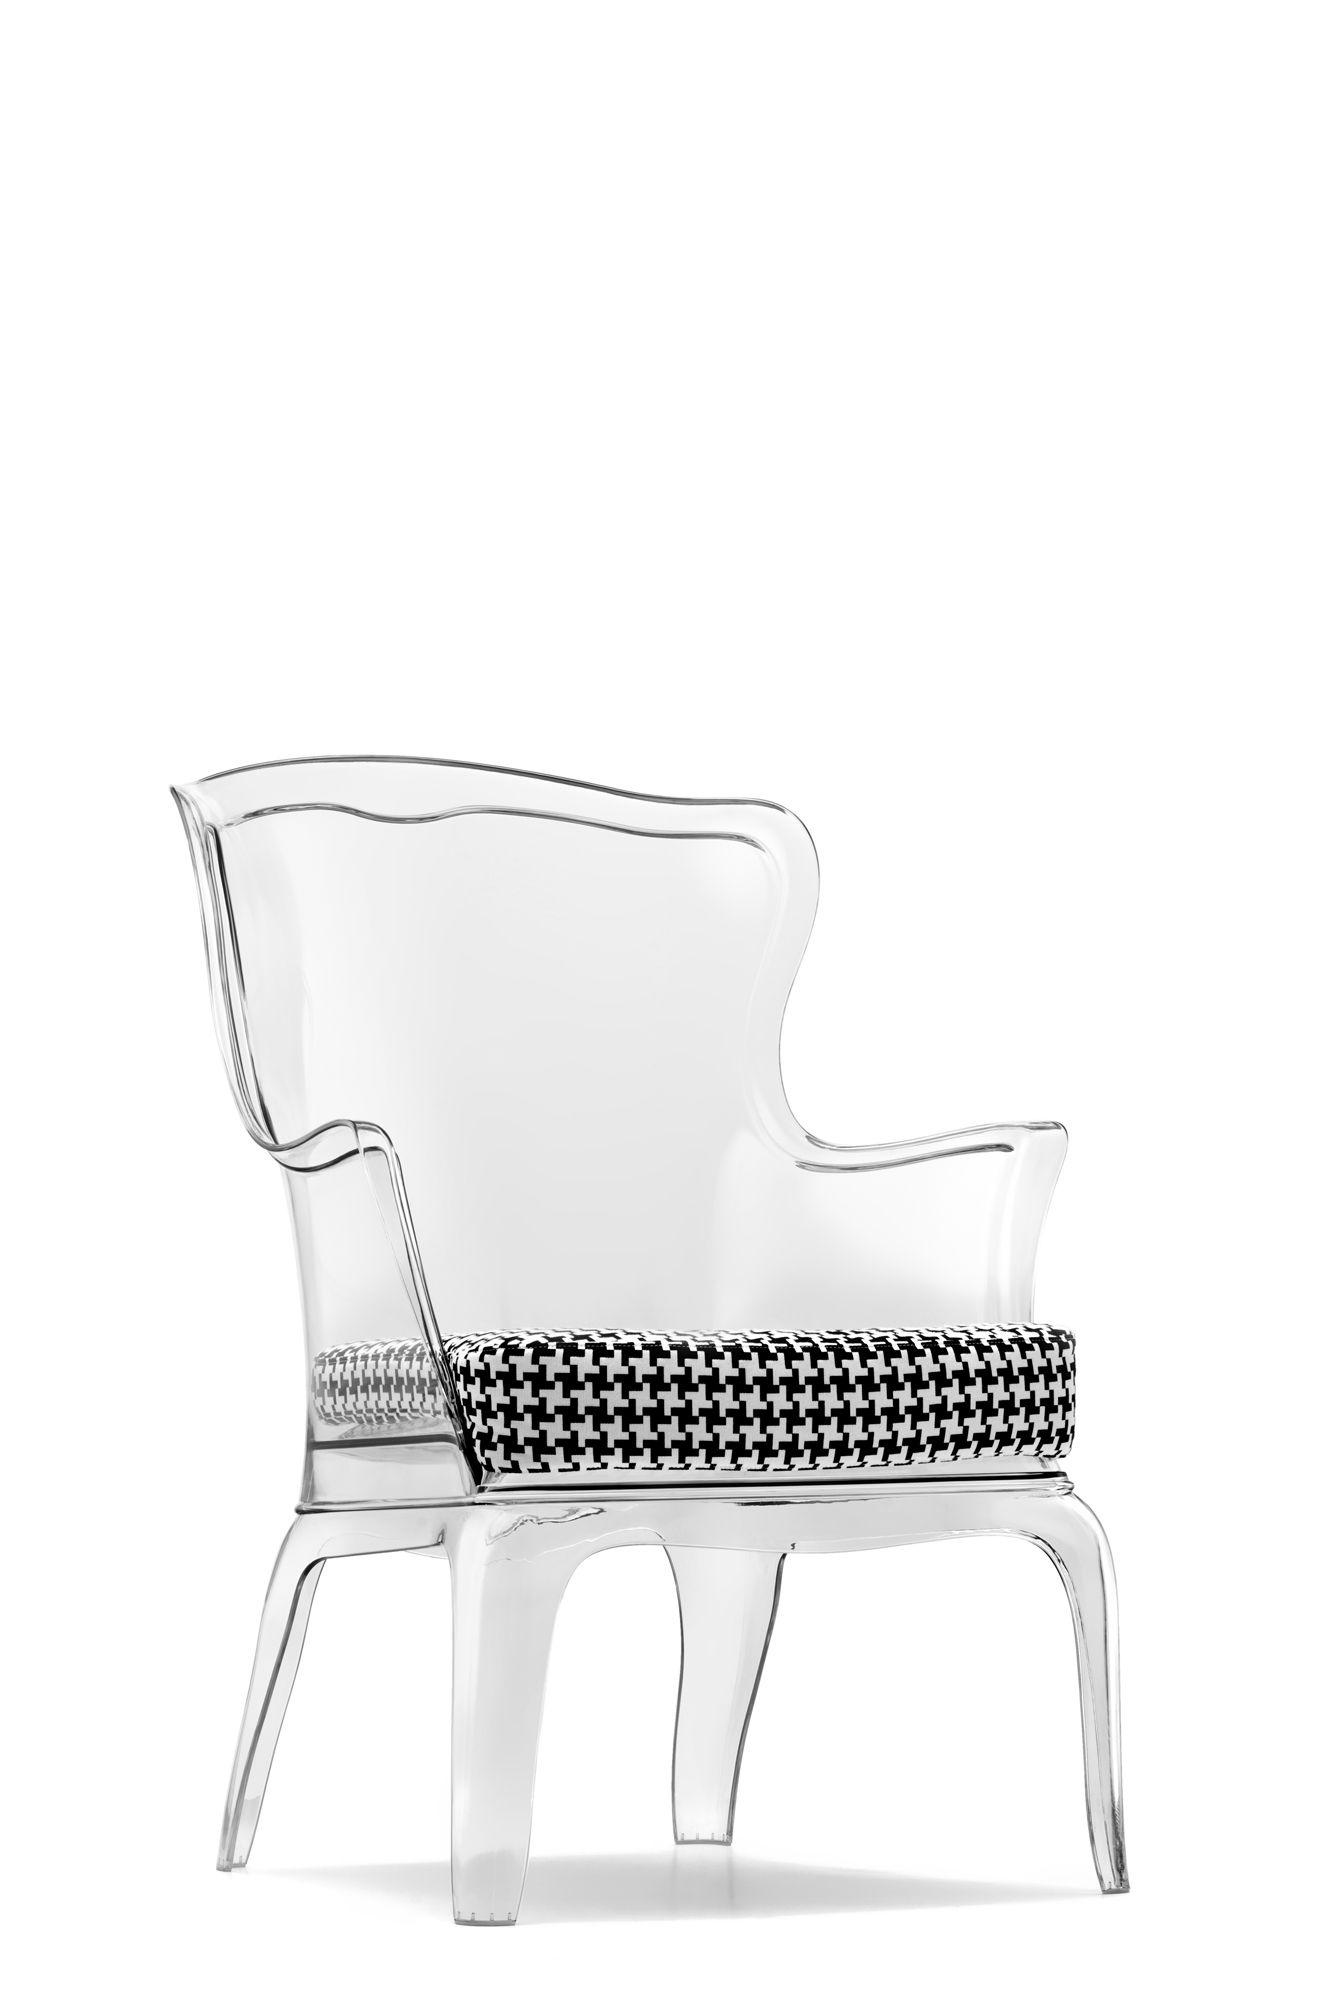 Elegante Acryl Sessel | Coole stühle, Bequeme stühle und Stühle